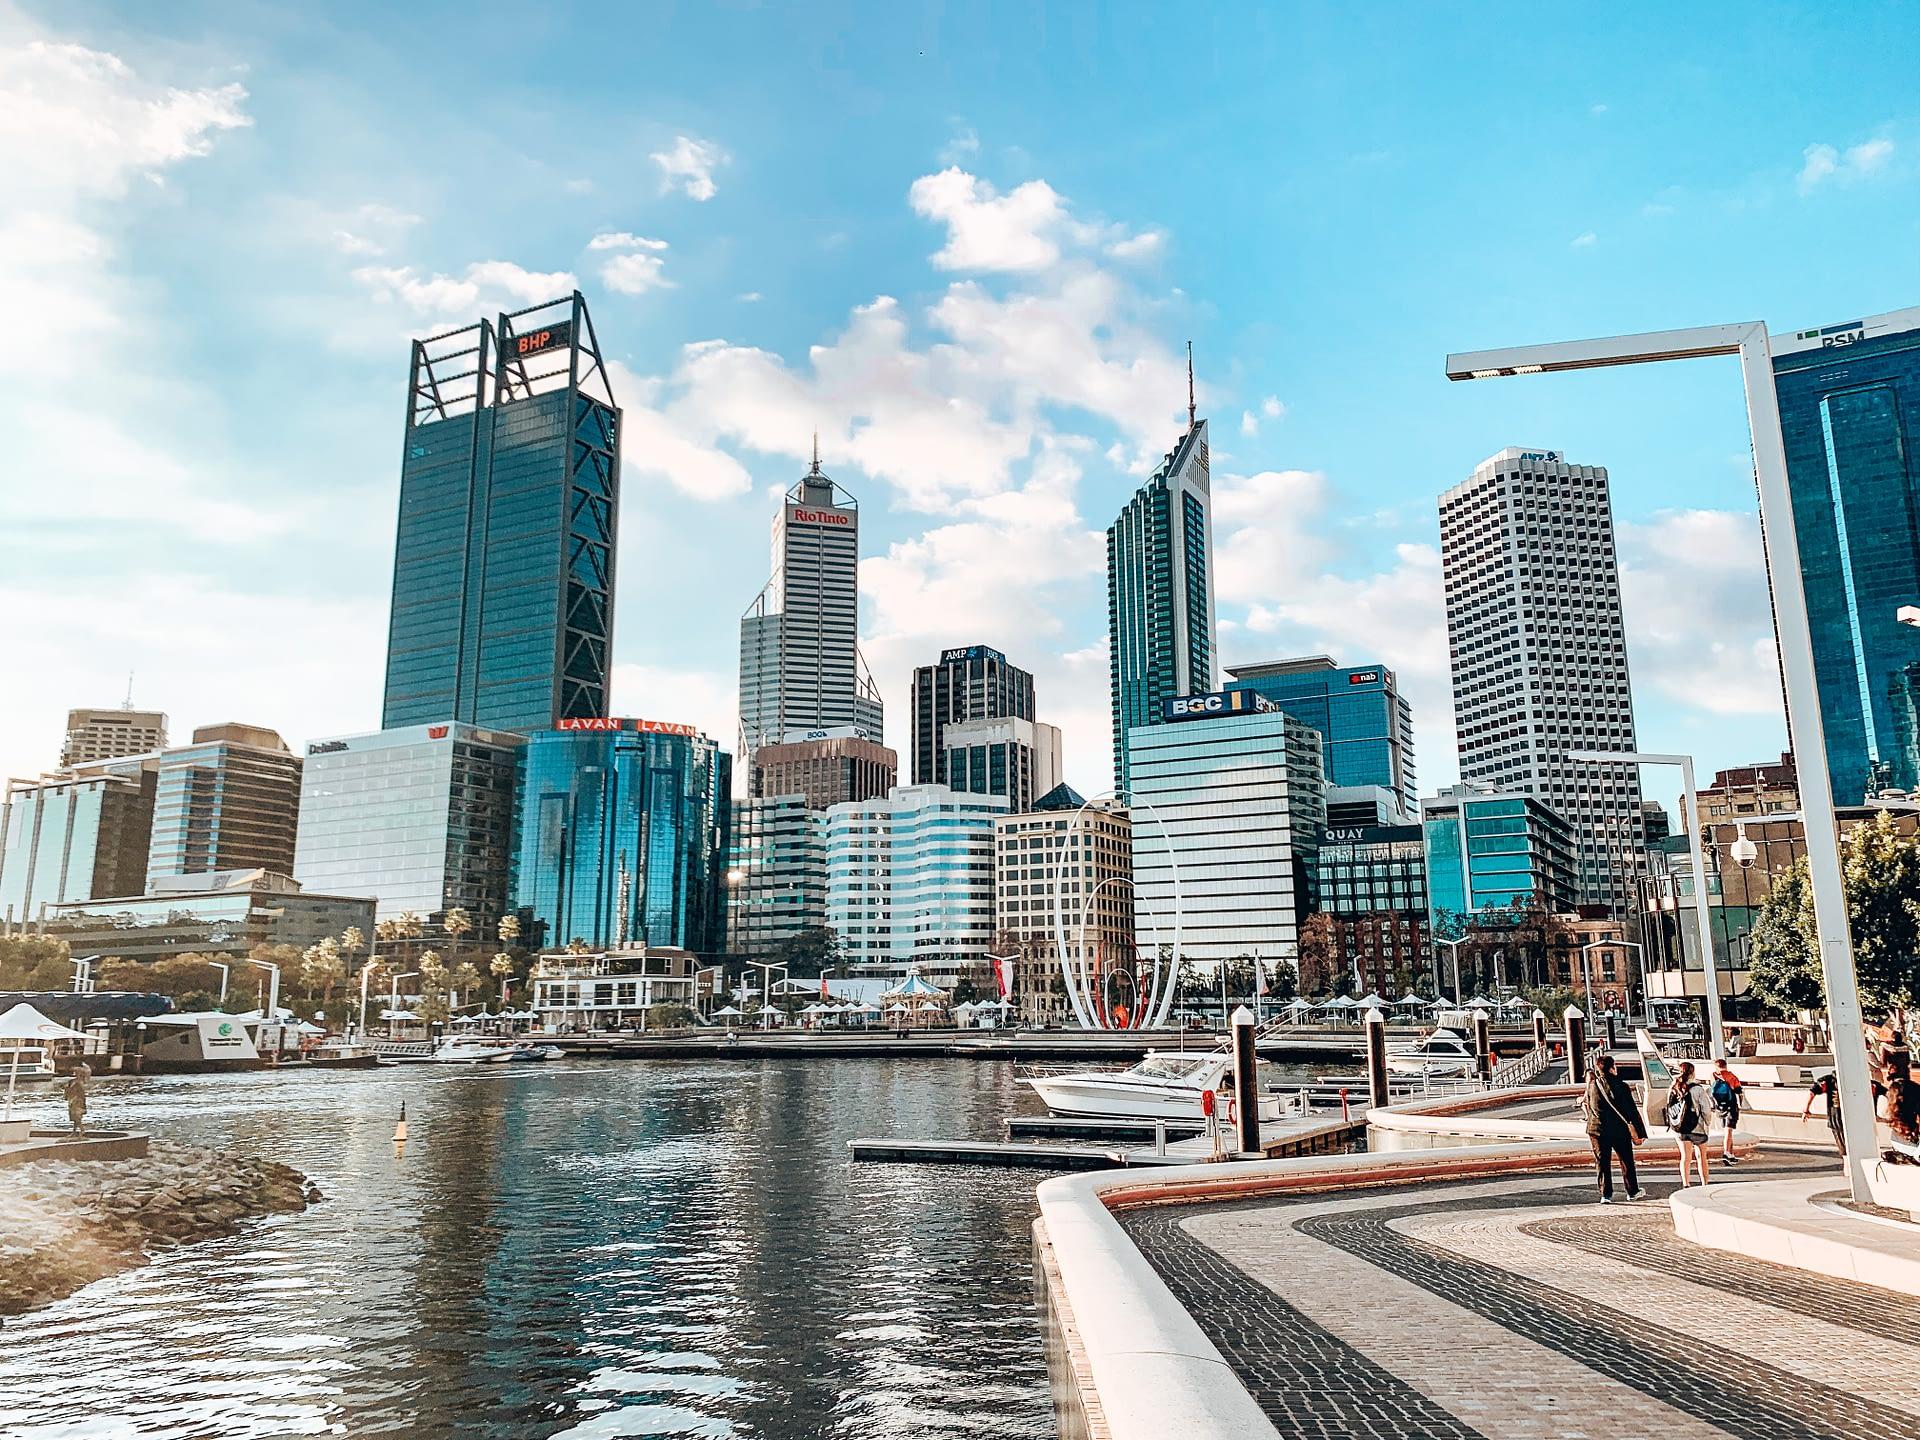 Elizabeth Quay Perth with Perth CBD Skyline in the background